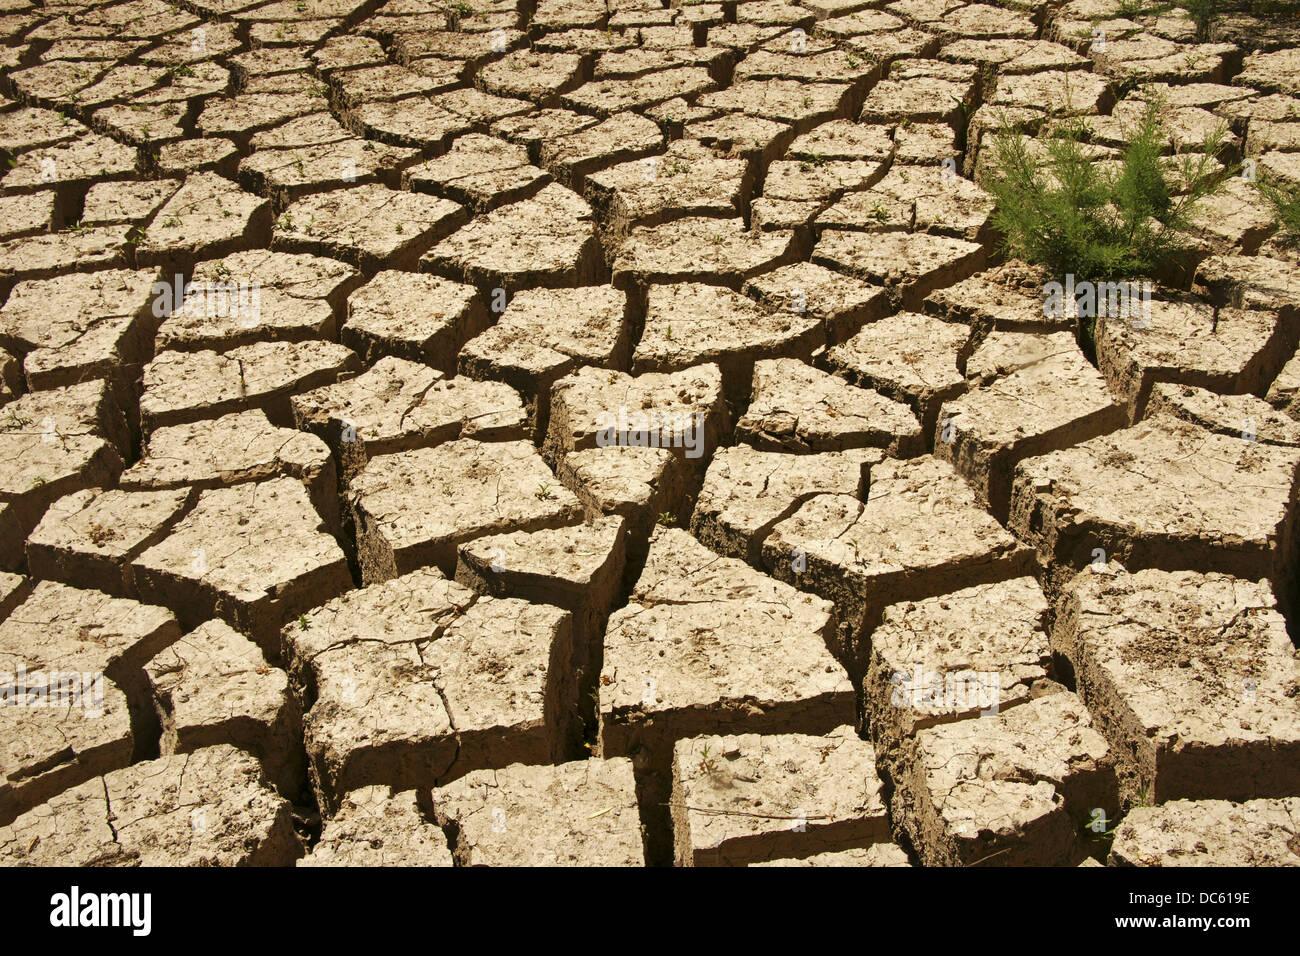 Drought, water rain missing - Stock Image